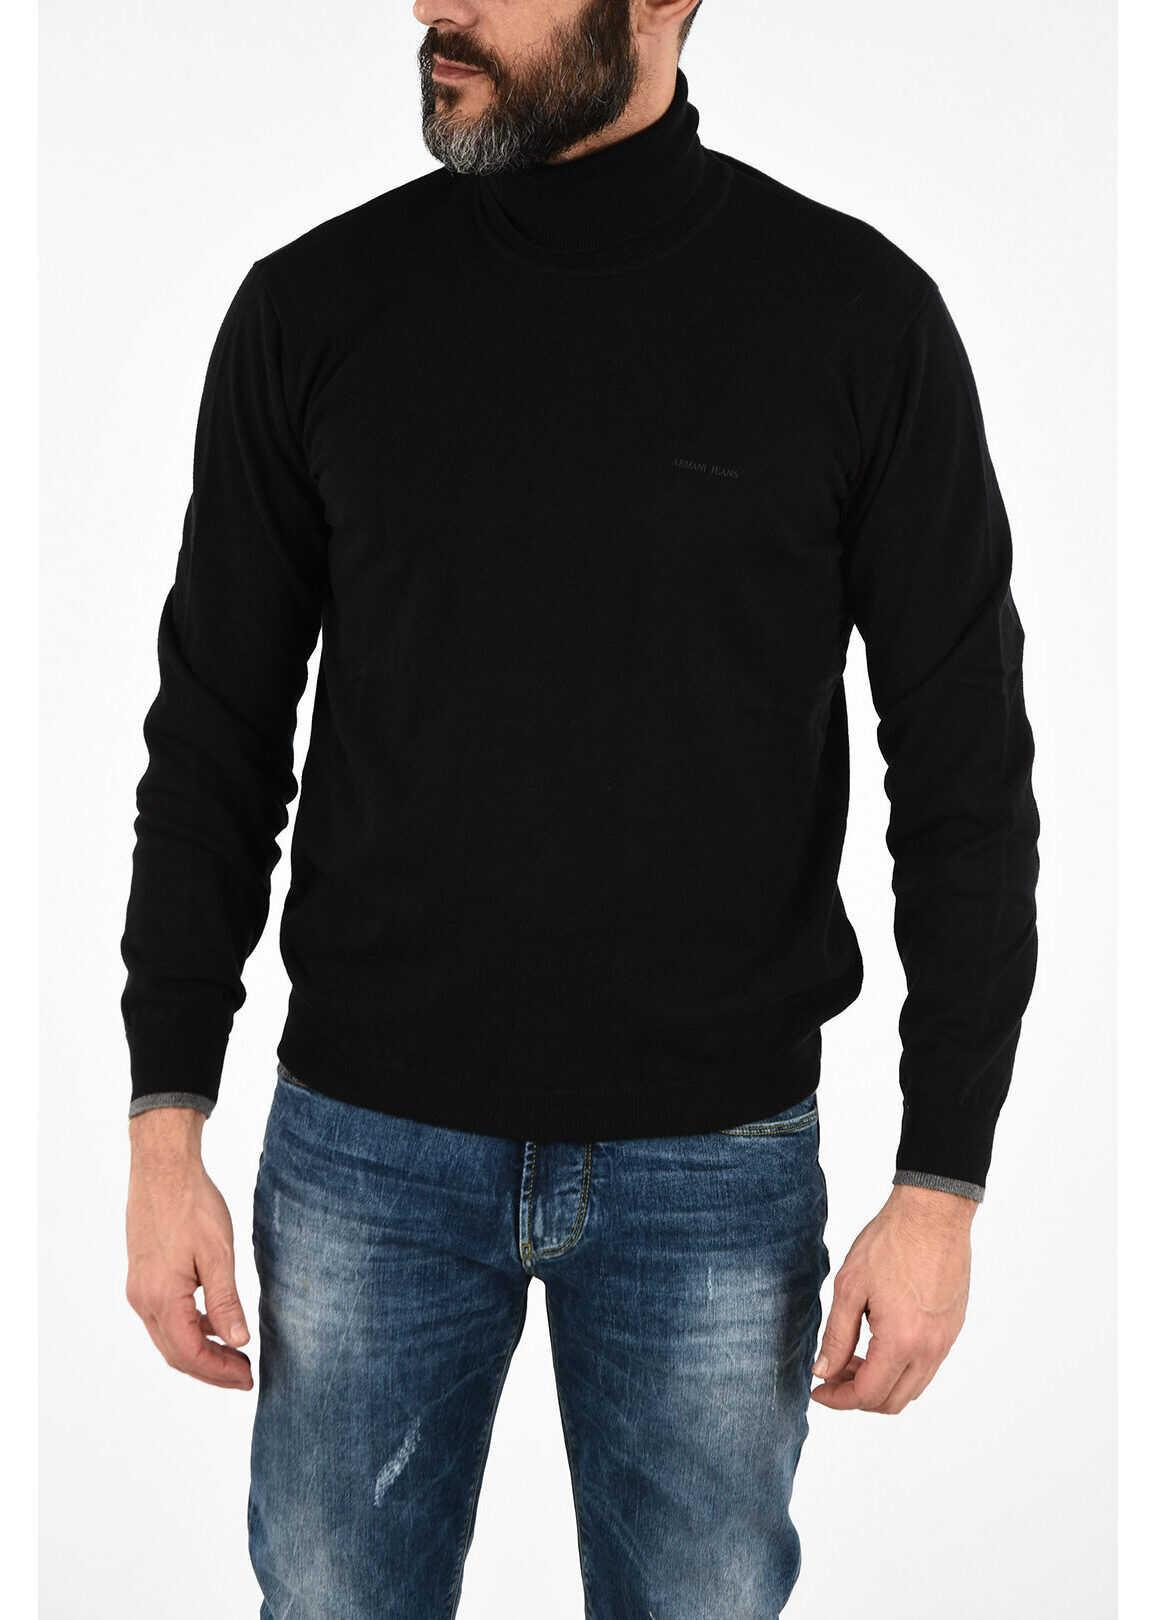 Armani ARMANI JEANS Turtleneck Sweater BLACK imagine